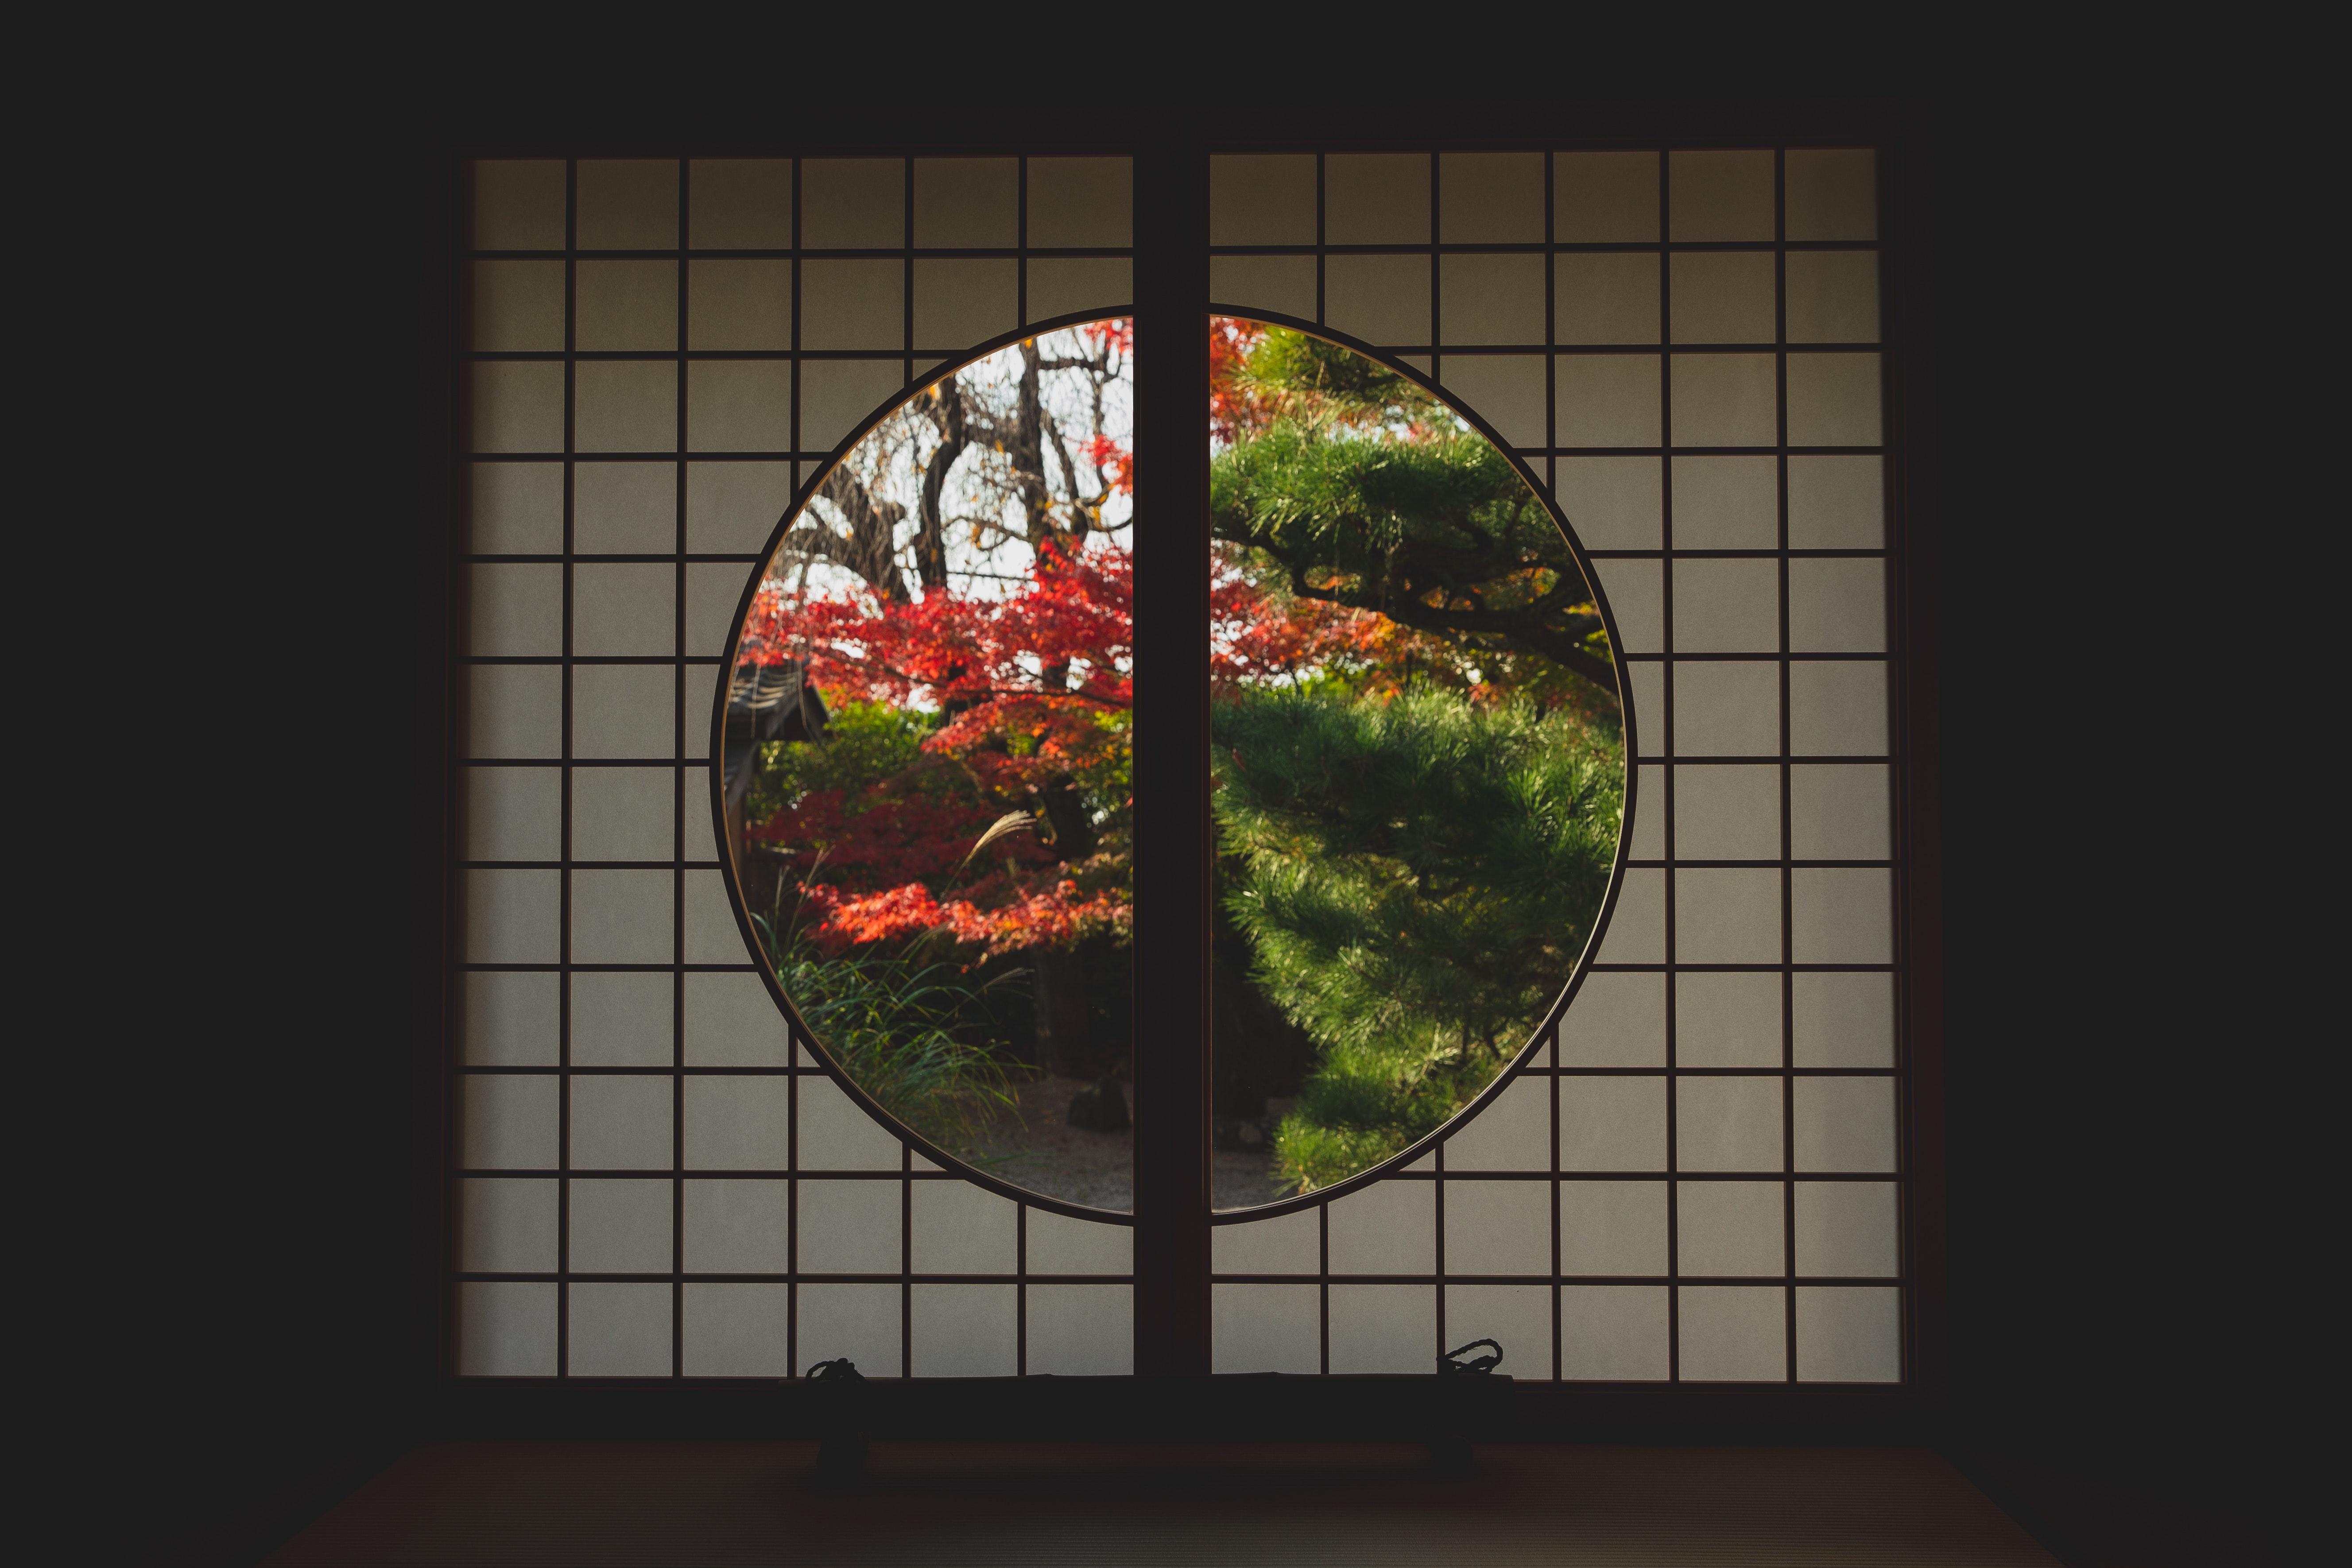 pexels-ryutaro-tsukata-6249543.jpg